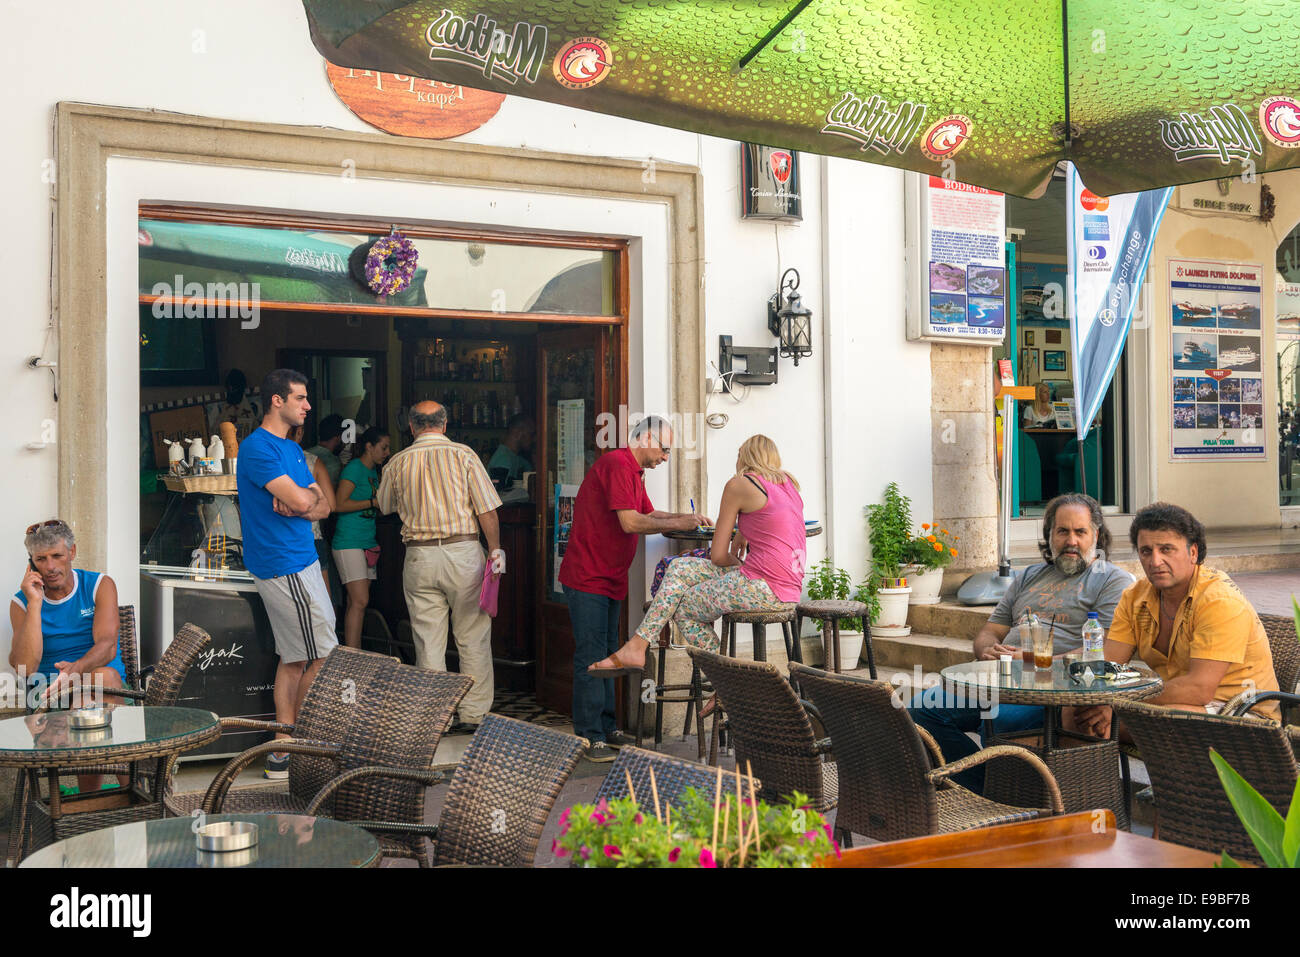 Greeks in a street café, Kos, island of Kos, Greece - Stock Image